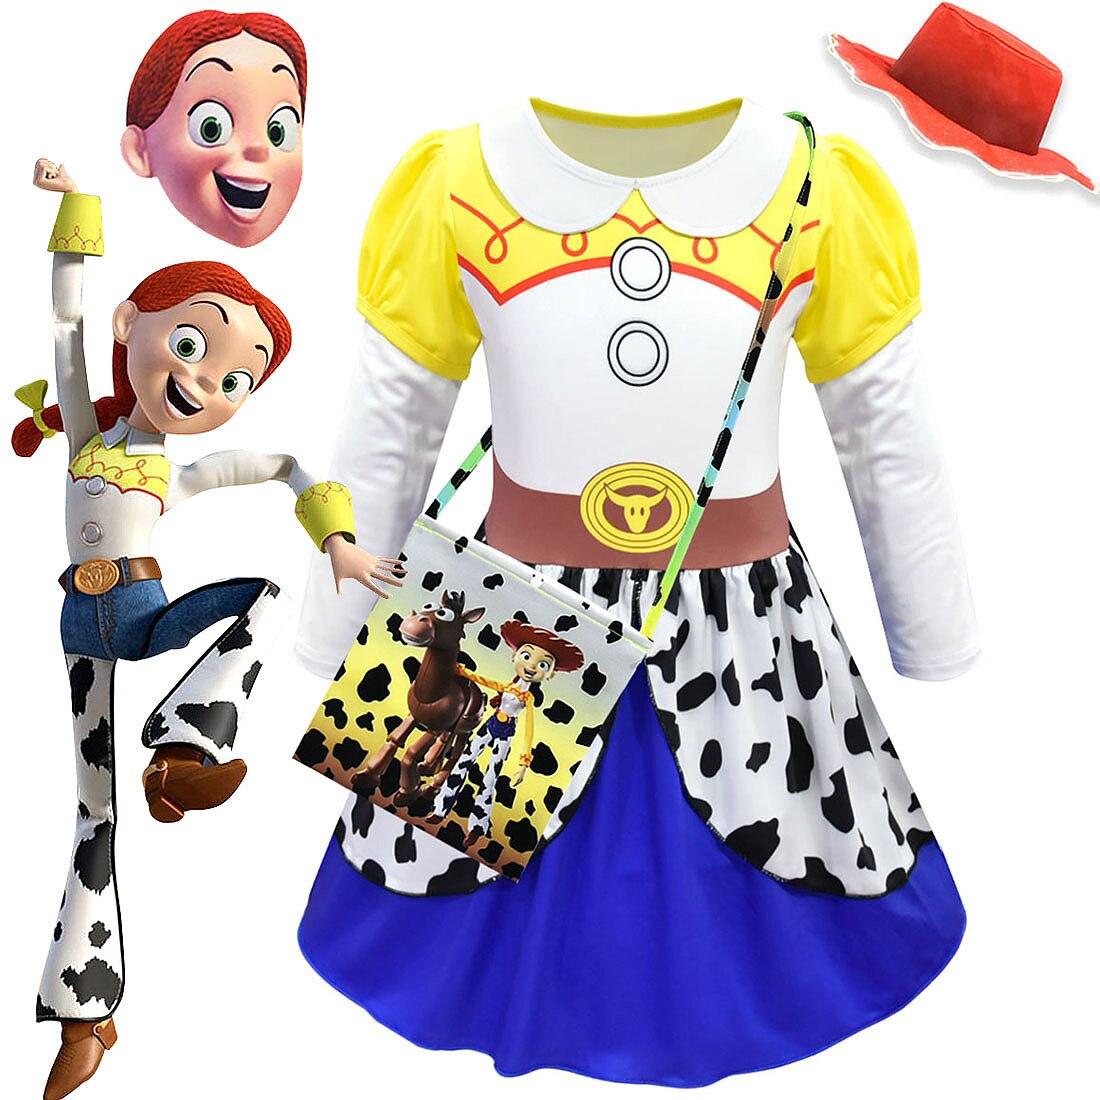 Girls Dresses Toy Story 4 Jessie Cosplay Halloween Costumes Toddler Kids Birthday Vestidos Carnival Christmas Costume For Girl